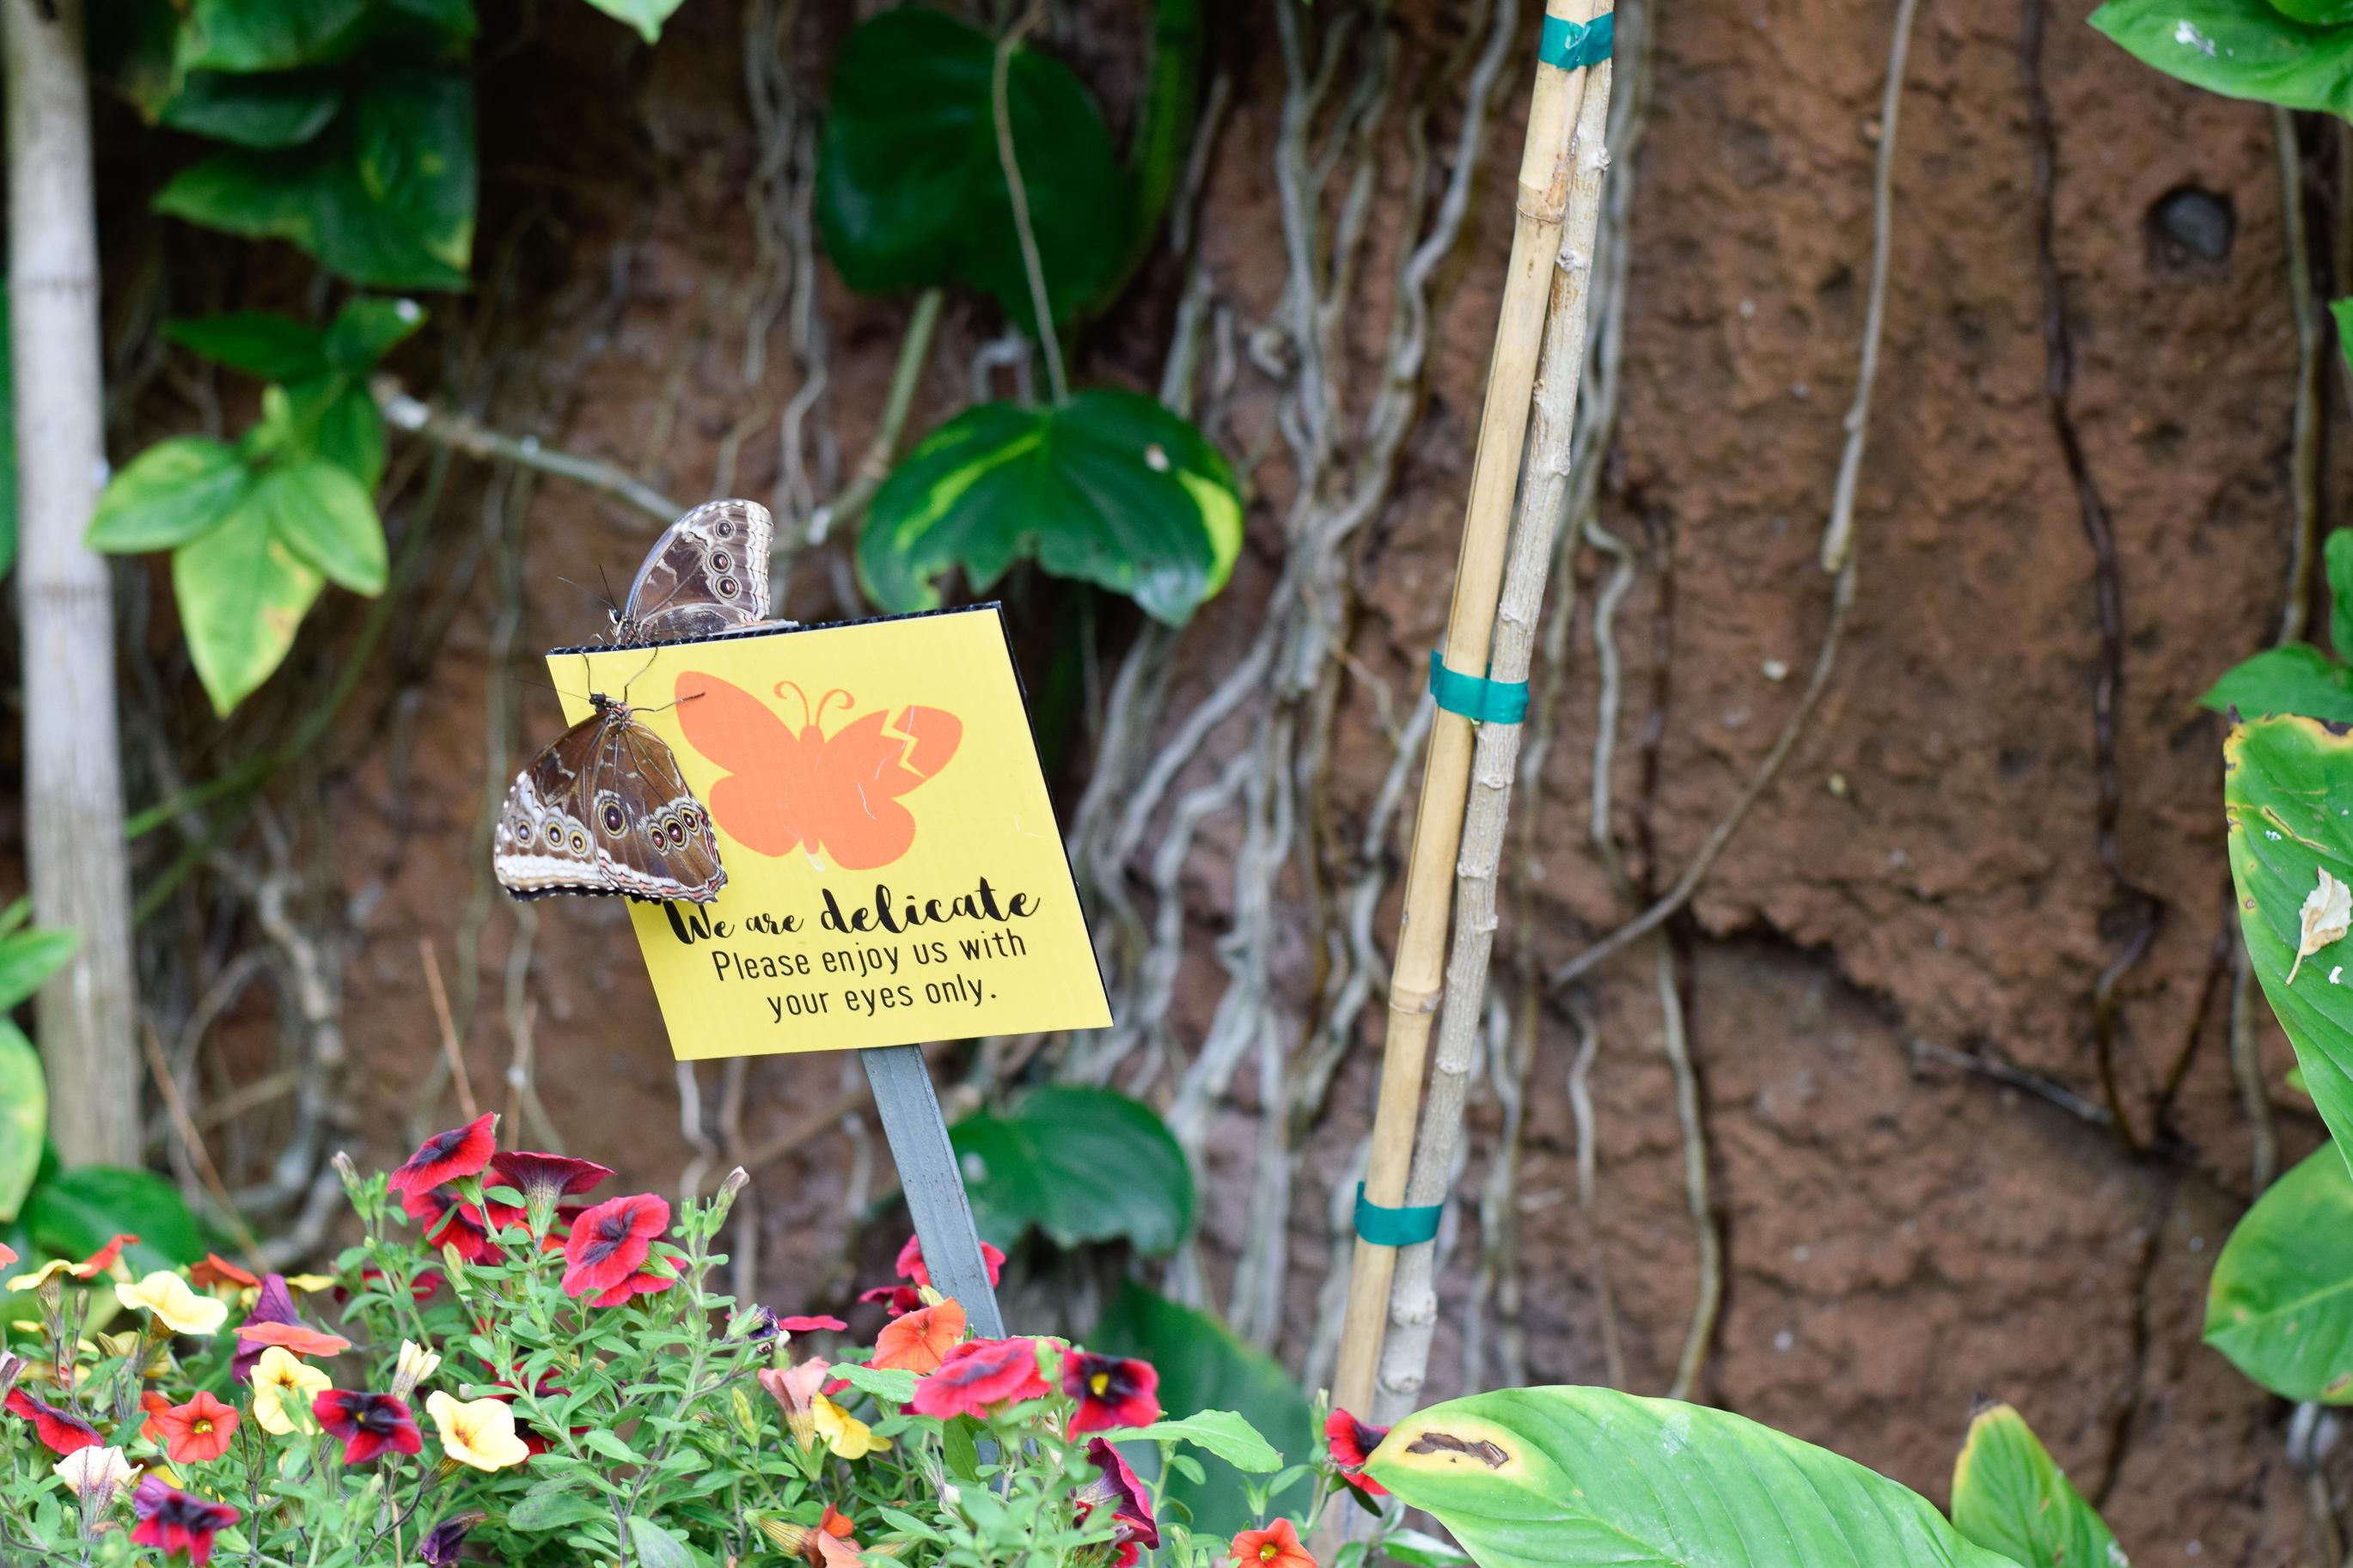 Butterfly-Jungle-2018-San Diego Zoo-Safari Park-Spring Break